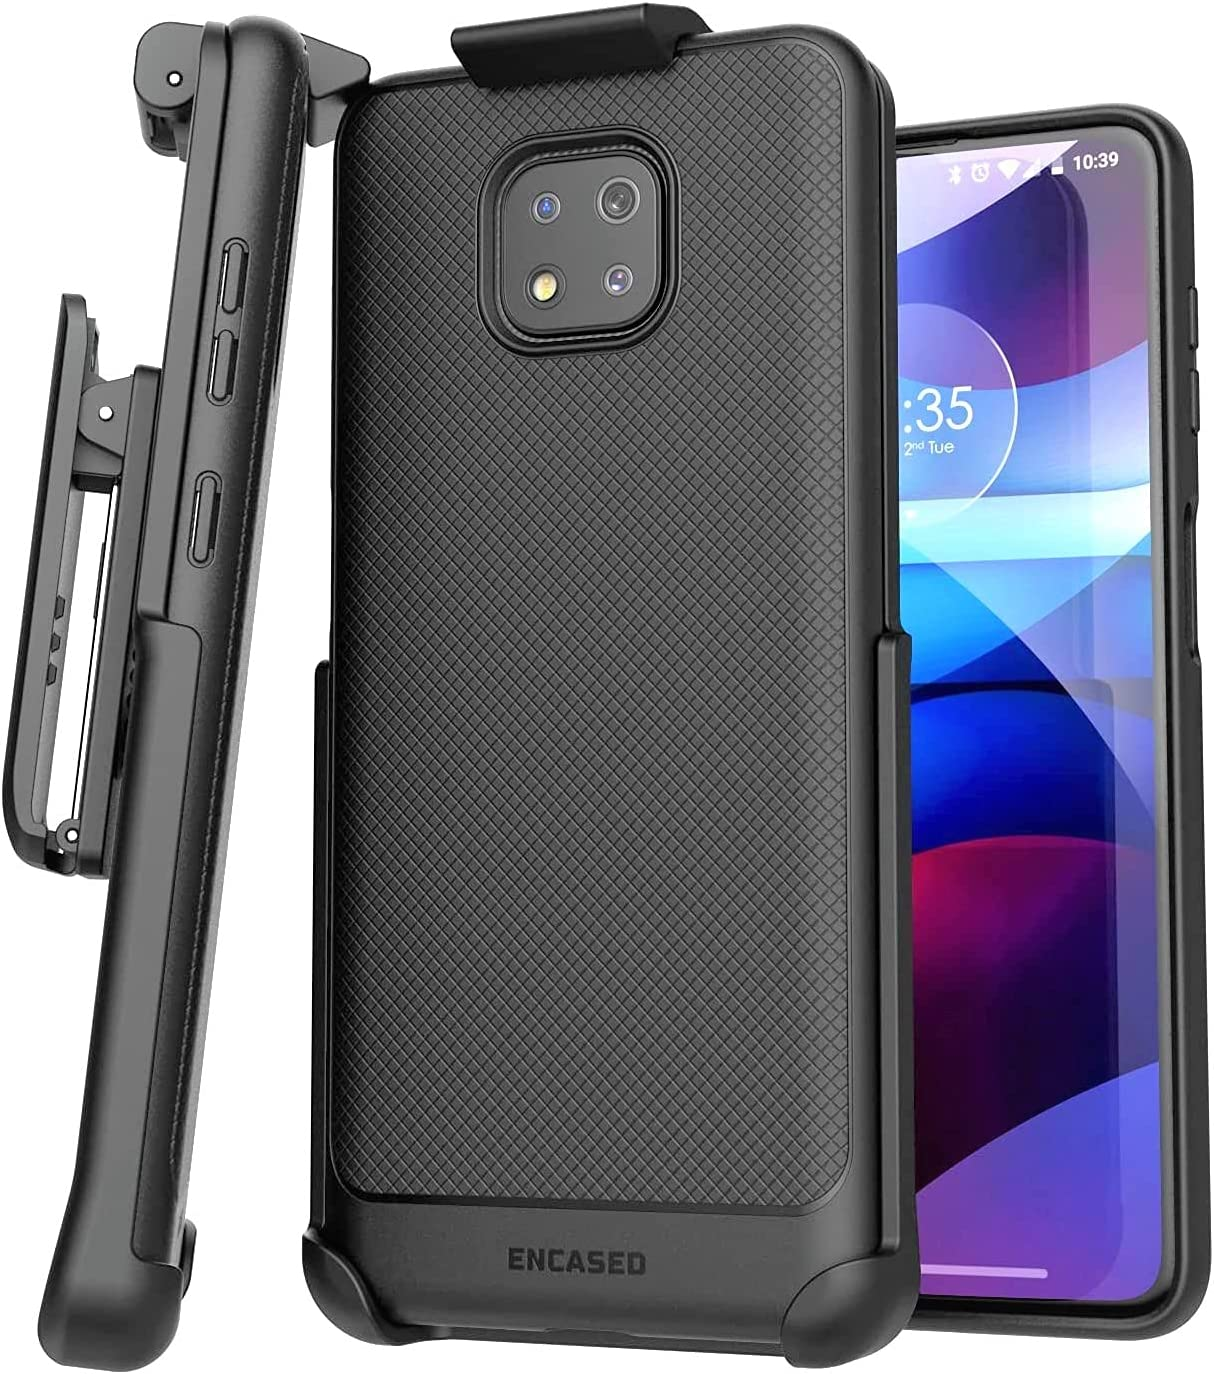 Encased Moto G Power 2021 Belt Clip Case (Thin Armor Series) Slim Grip Cover with Phone Holster, Black (Motorola G Power 2021 ONLY)